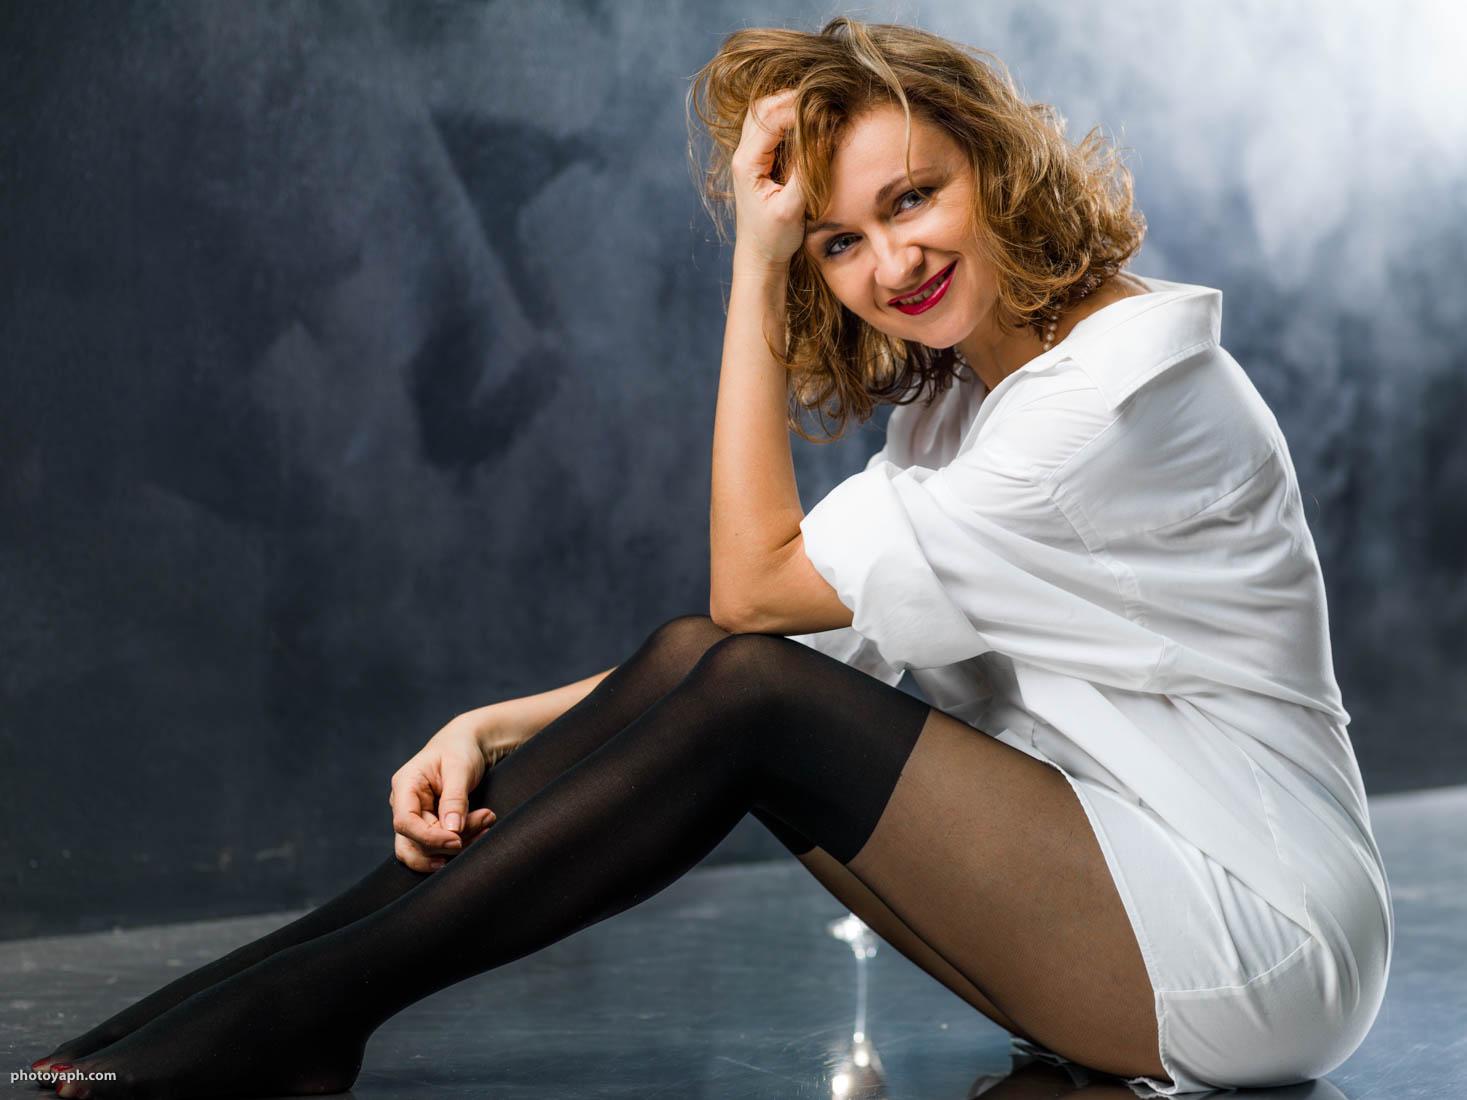 Viktoria-Milena-Yaph-74-2